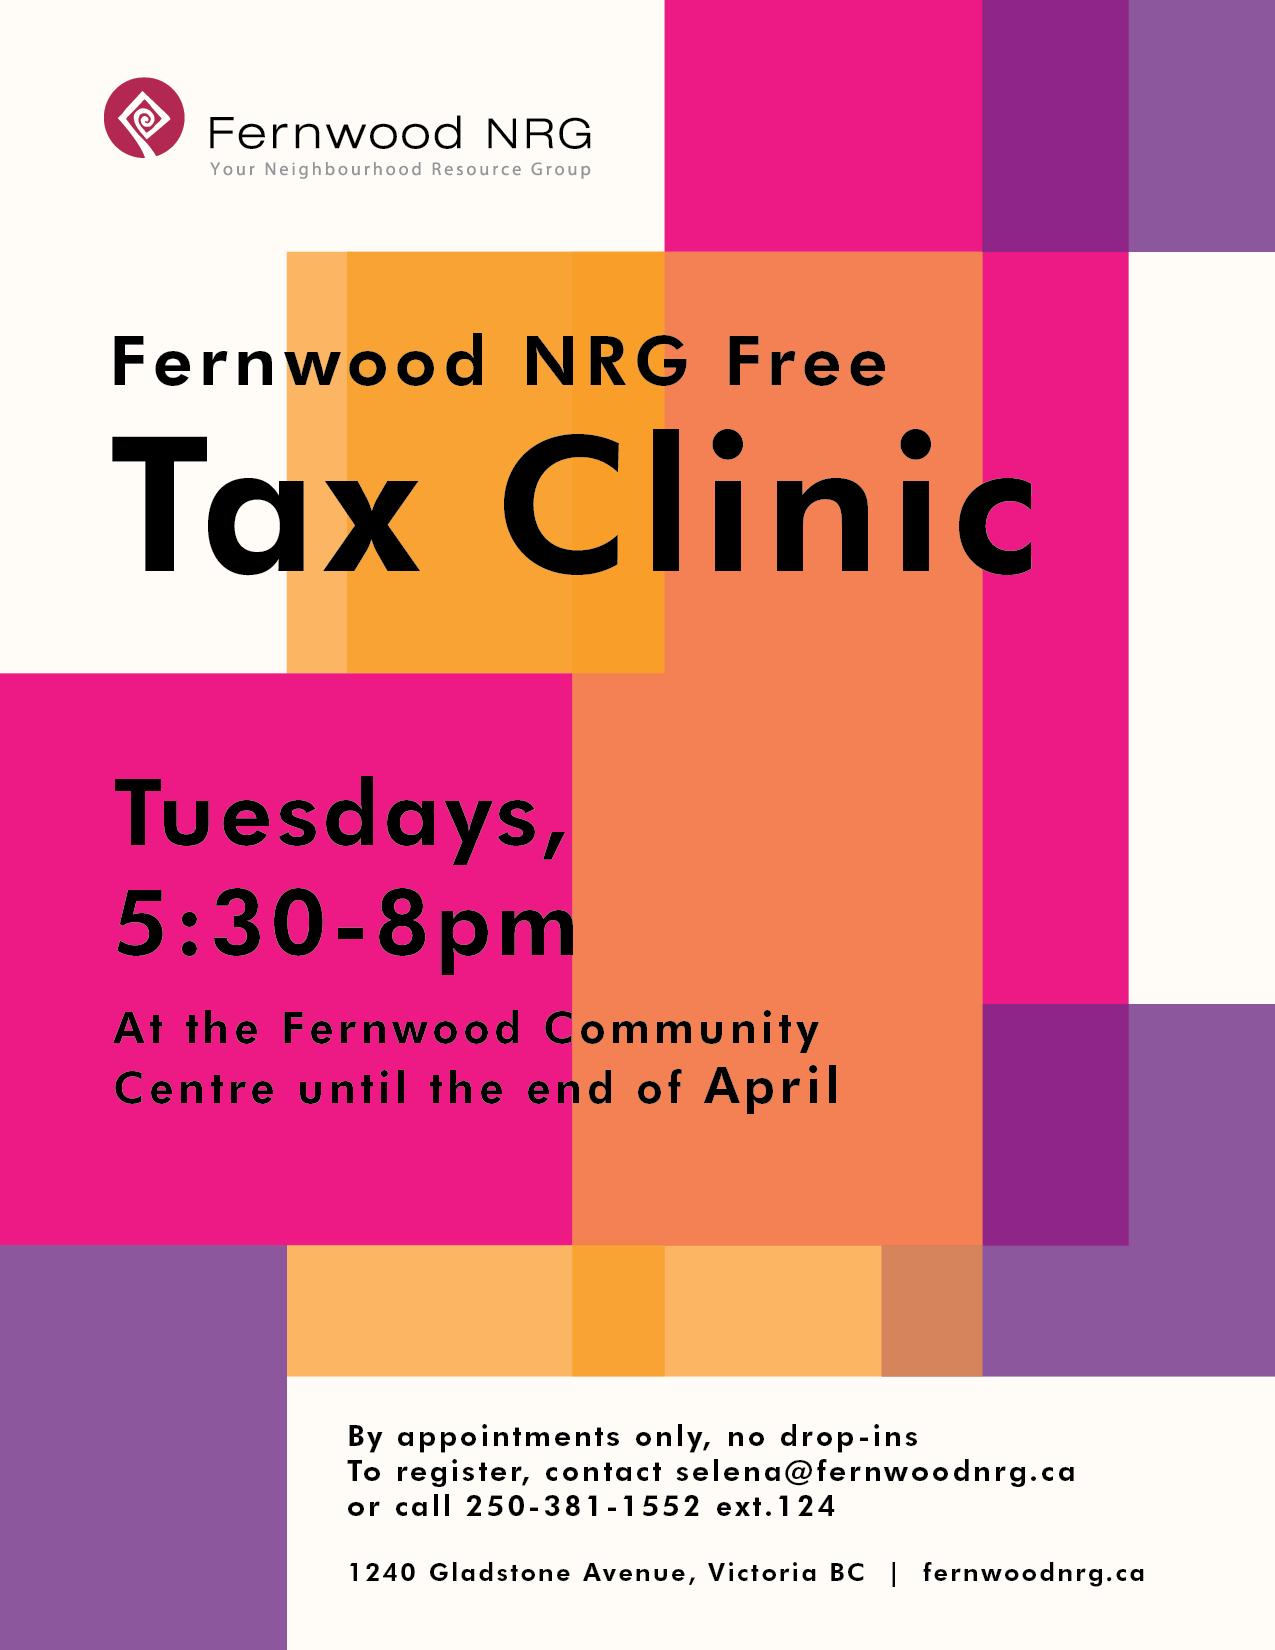 Fernwood NRG Free Tax Clinic 2021